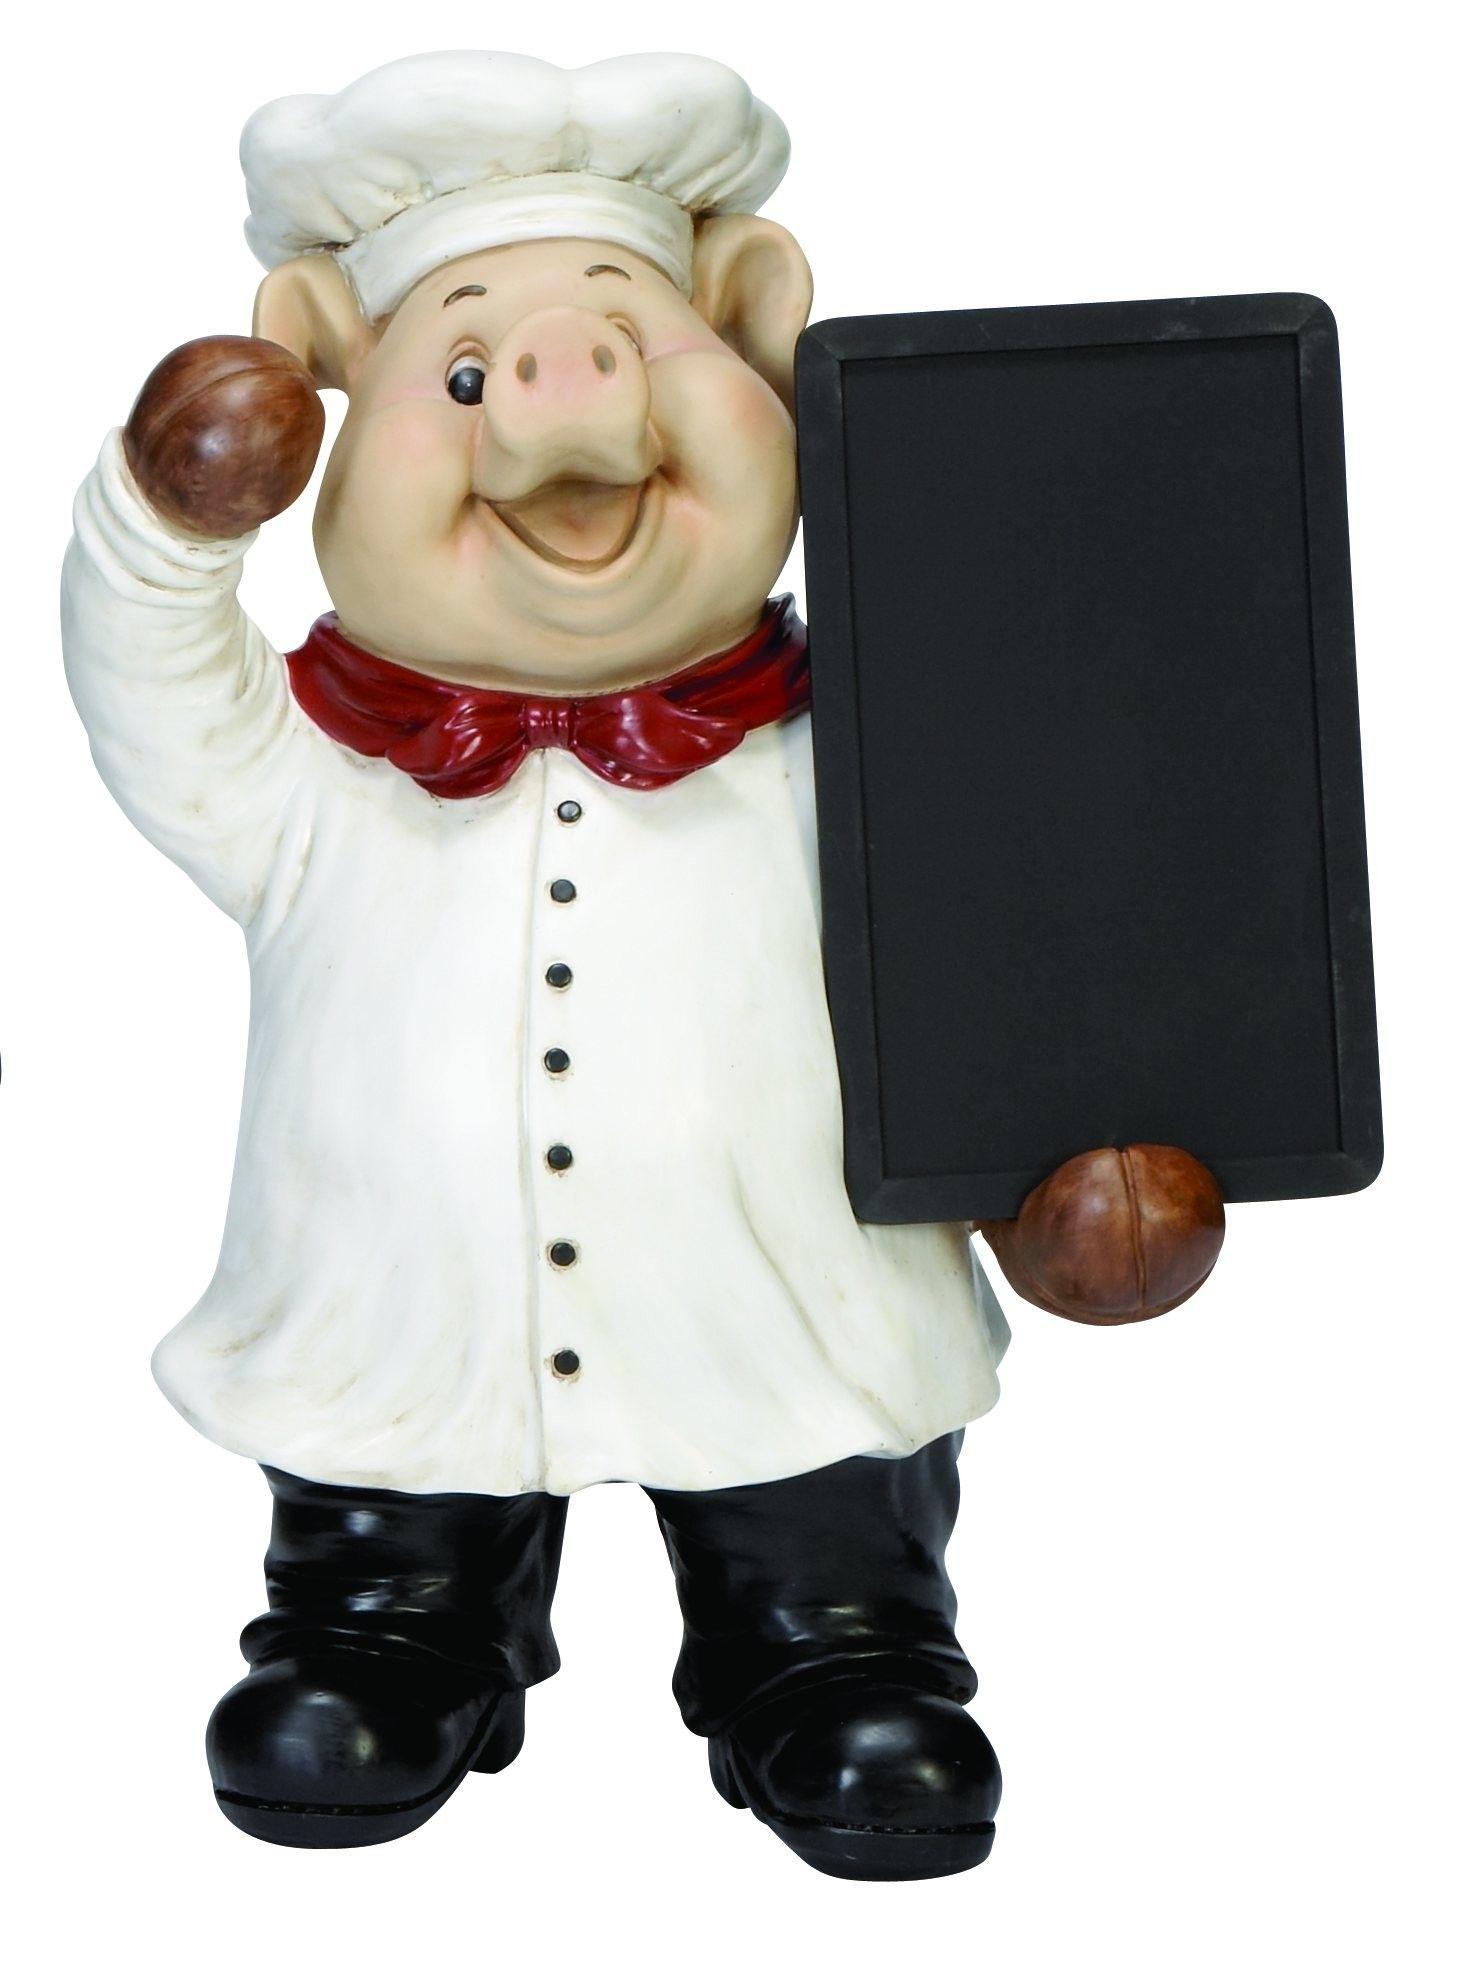 Pig Chef Figurine Chalkboard | Products | Pinterest | Chalkboards ...